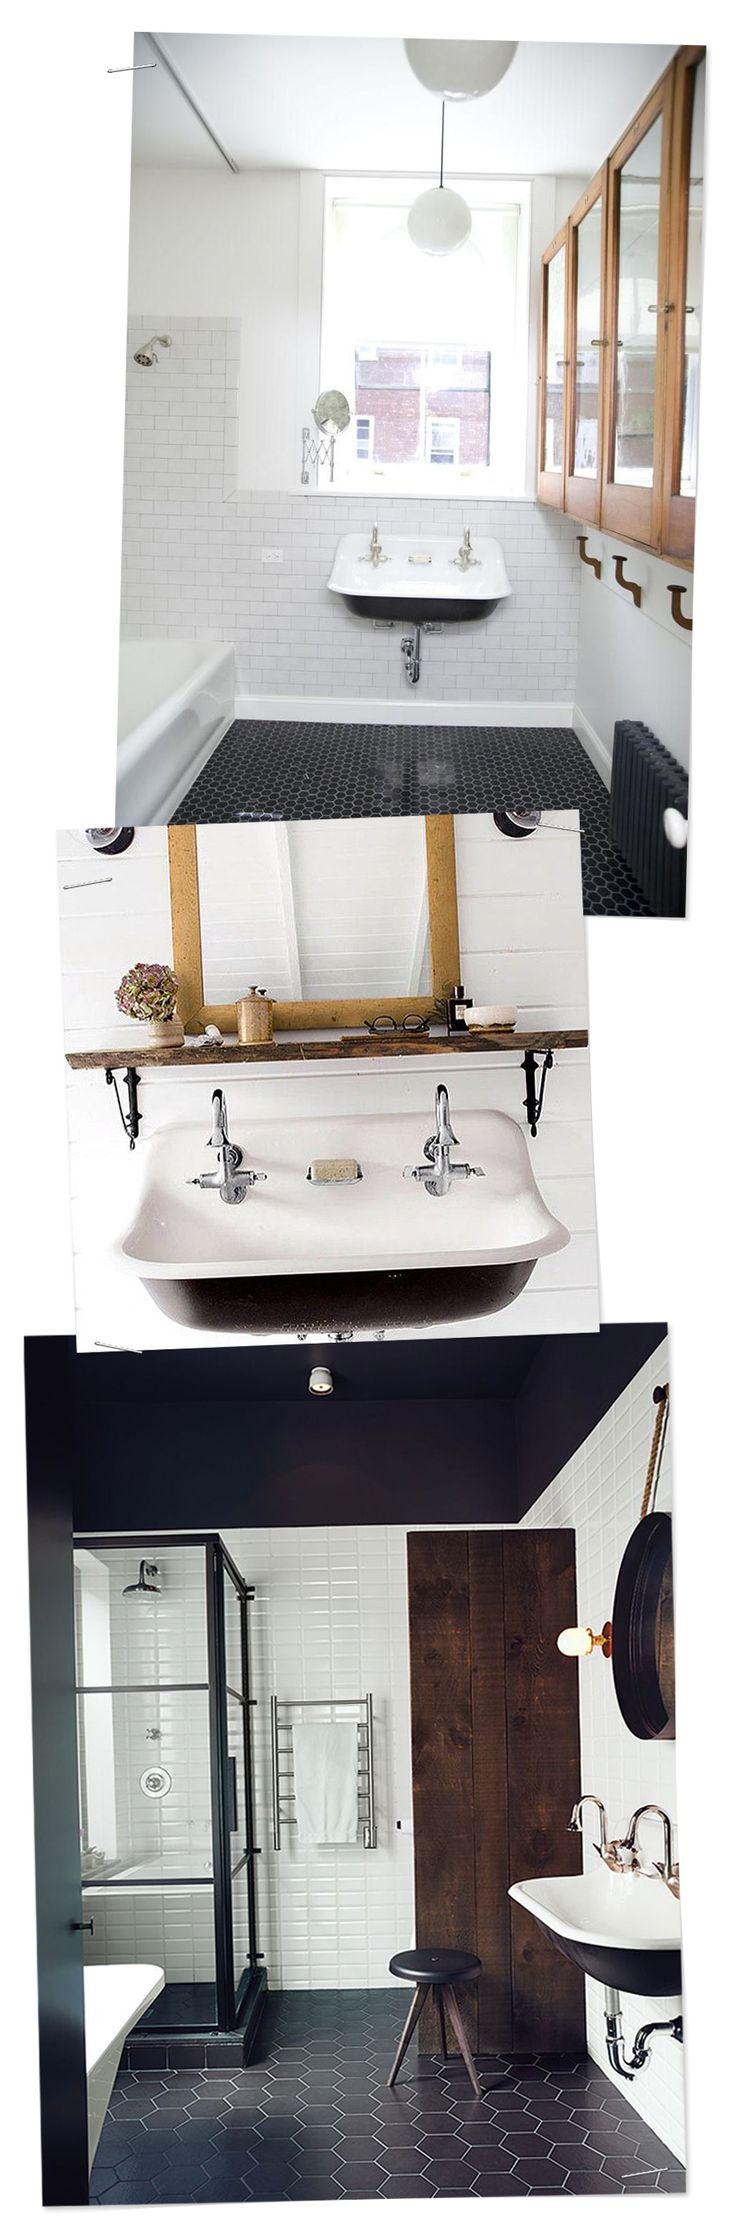 The tile shop design by kirsty georgian bathroom style - Inspirational Bathrooms Brockway Sink For A Bit Of Vintage